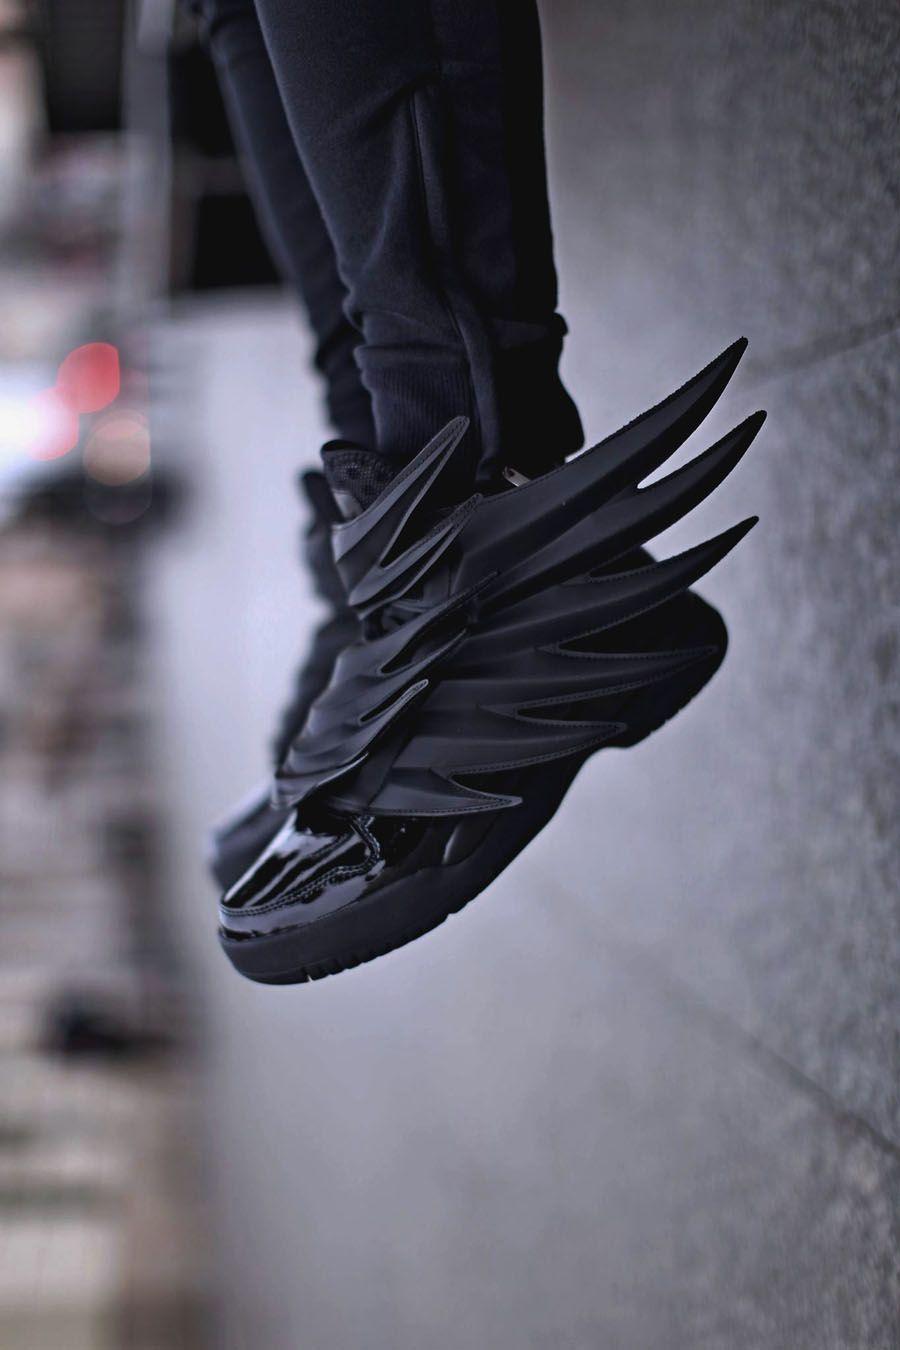 Nike Jordan J2K VII Patchwork Sz US 9 Free Shipping ebay